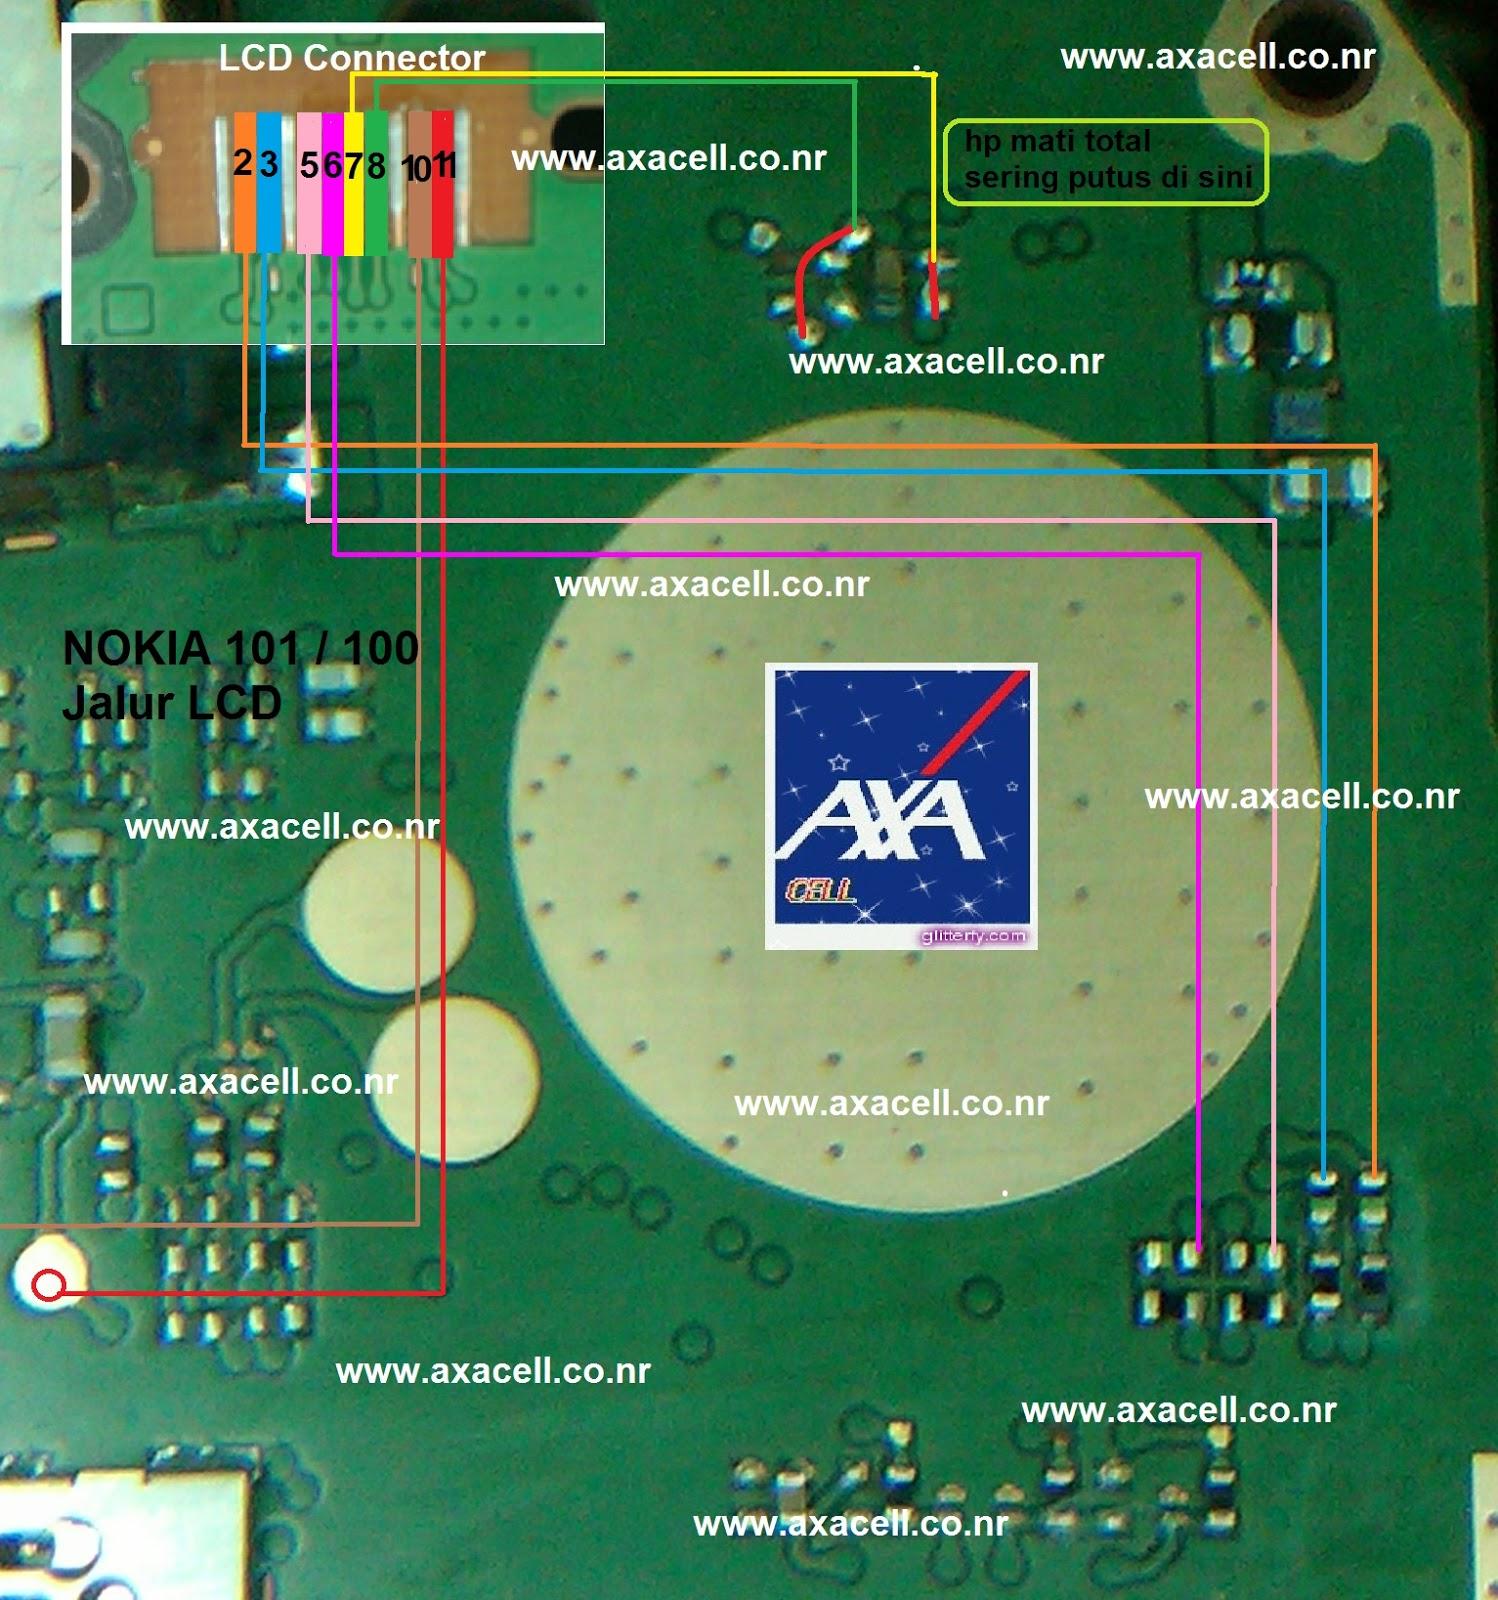 Axacell Nokia Mati Karna Jalur Lcd